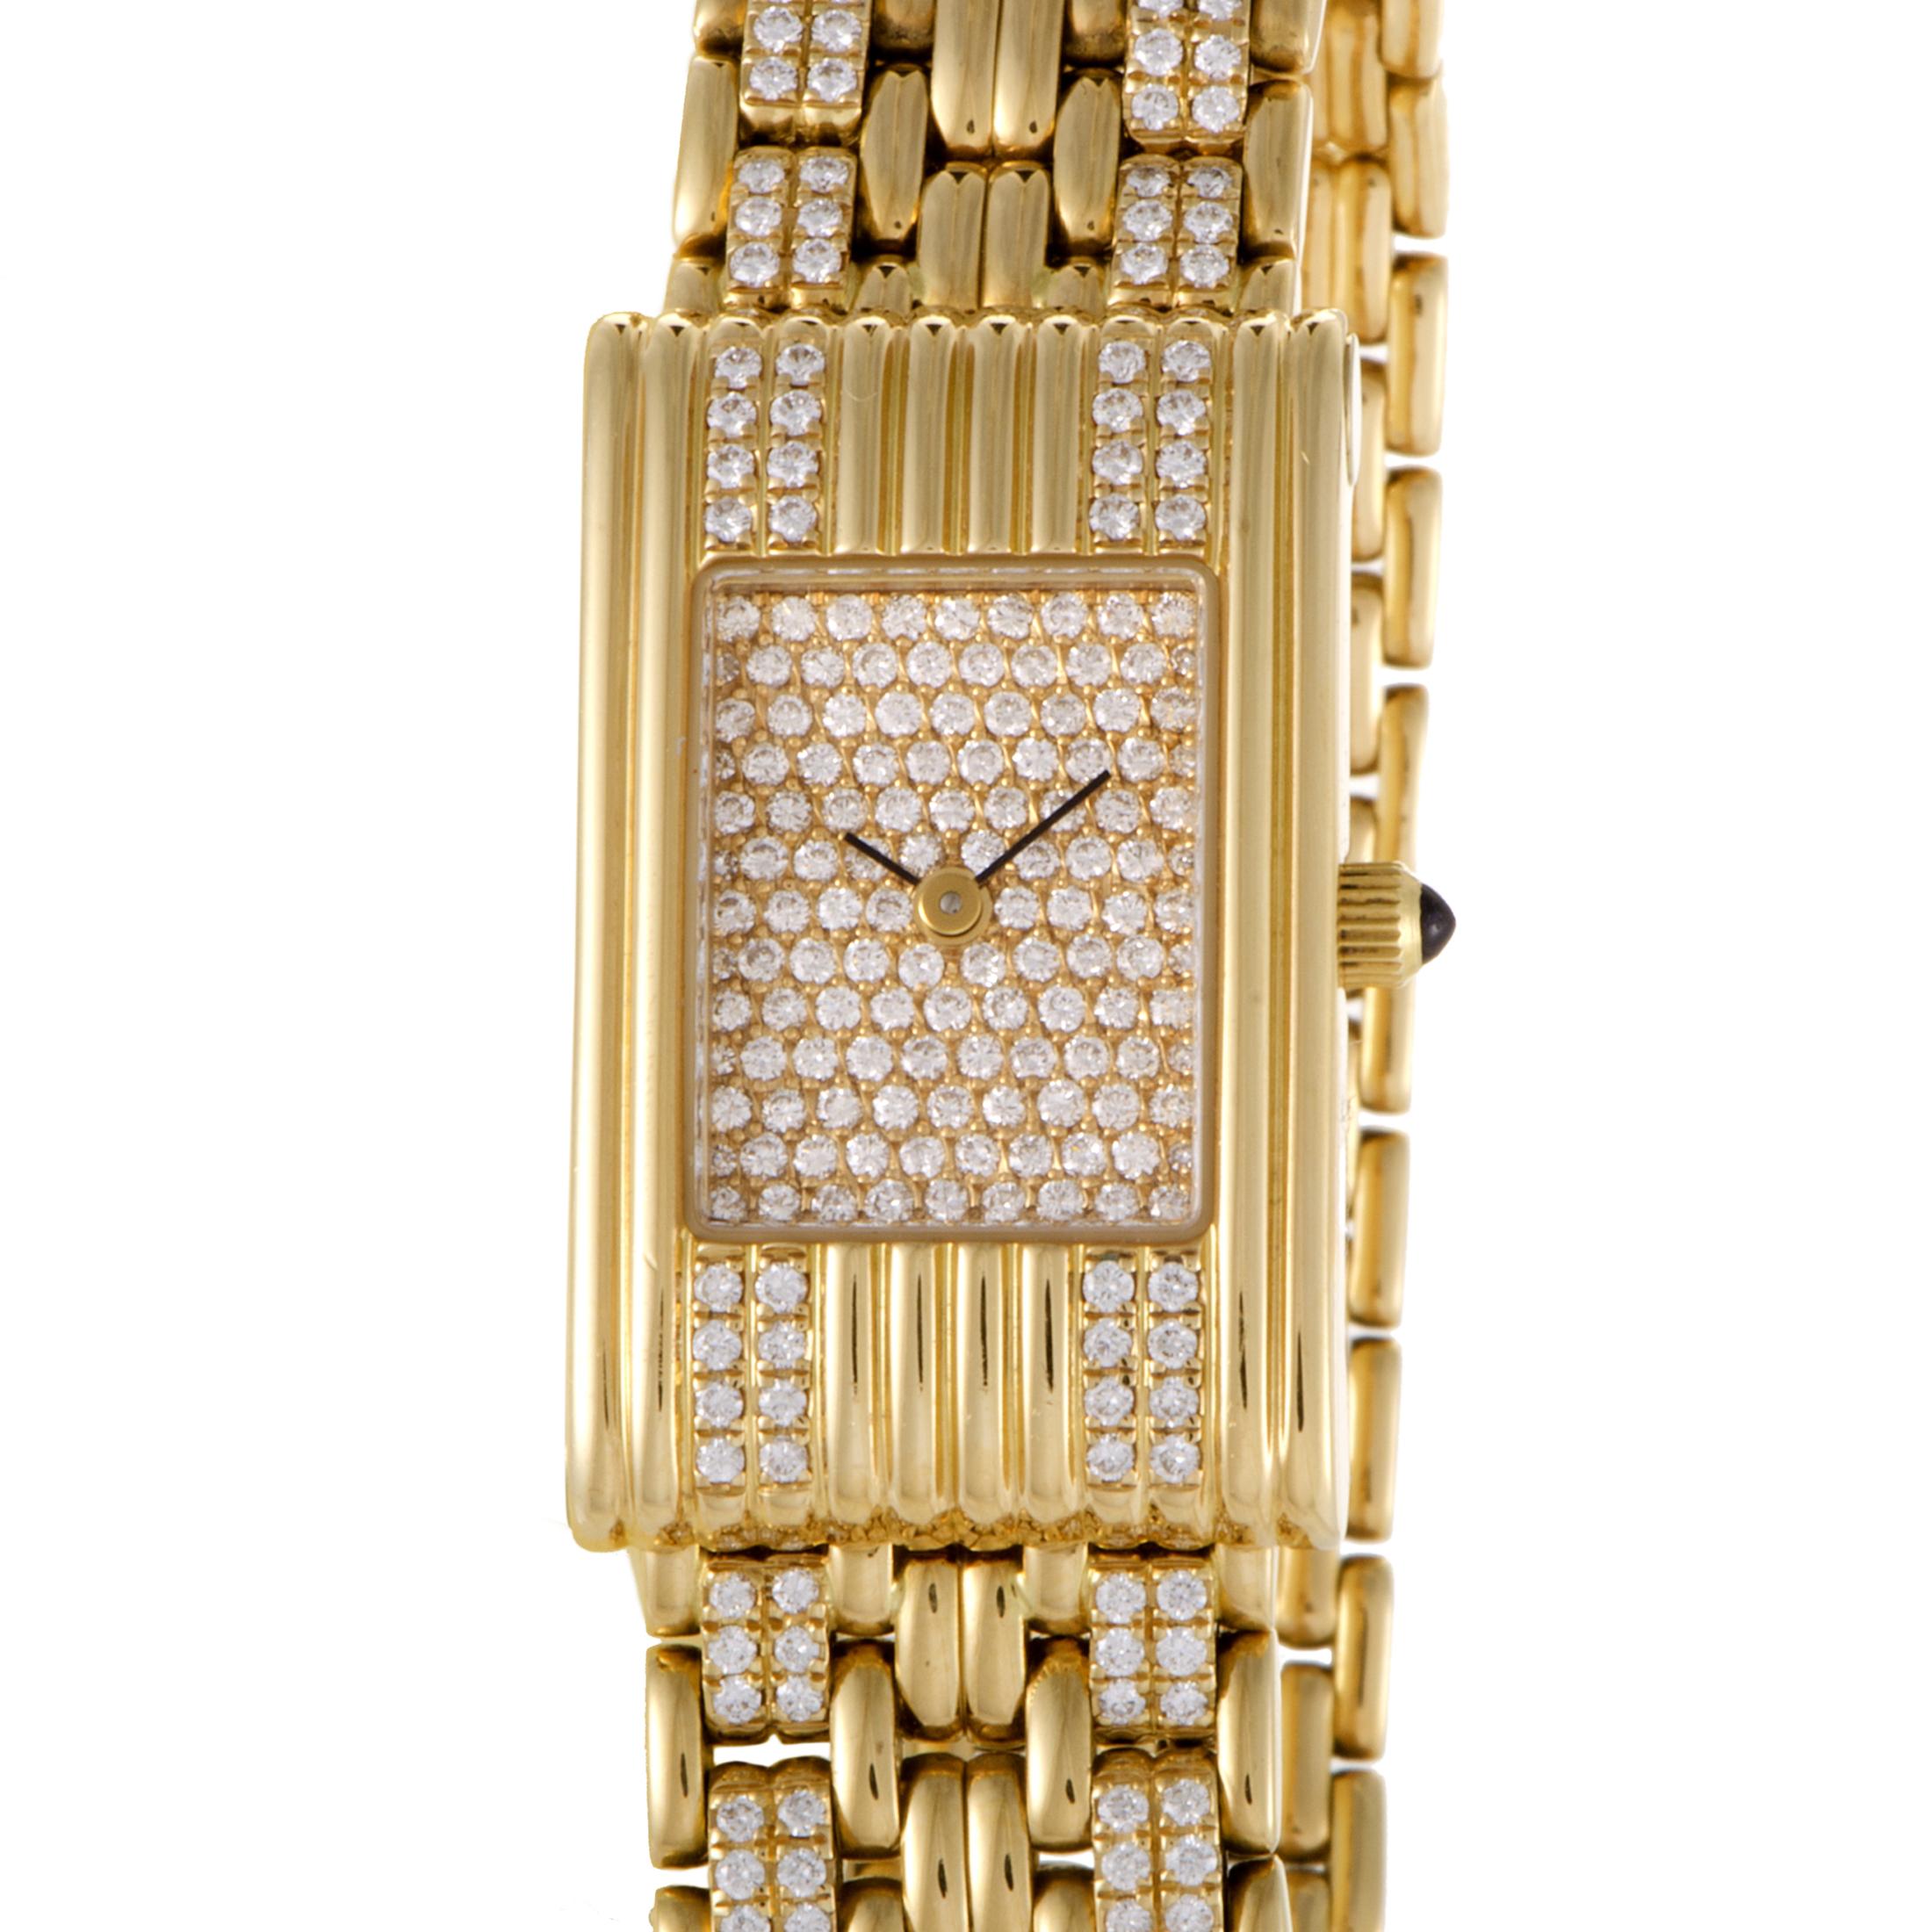 Boucheron Les Montres 18K Yellow Gold Diamond Watch with Interchangeable Straps